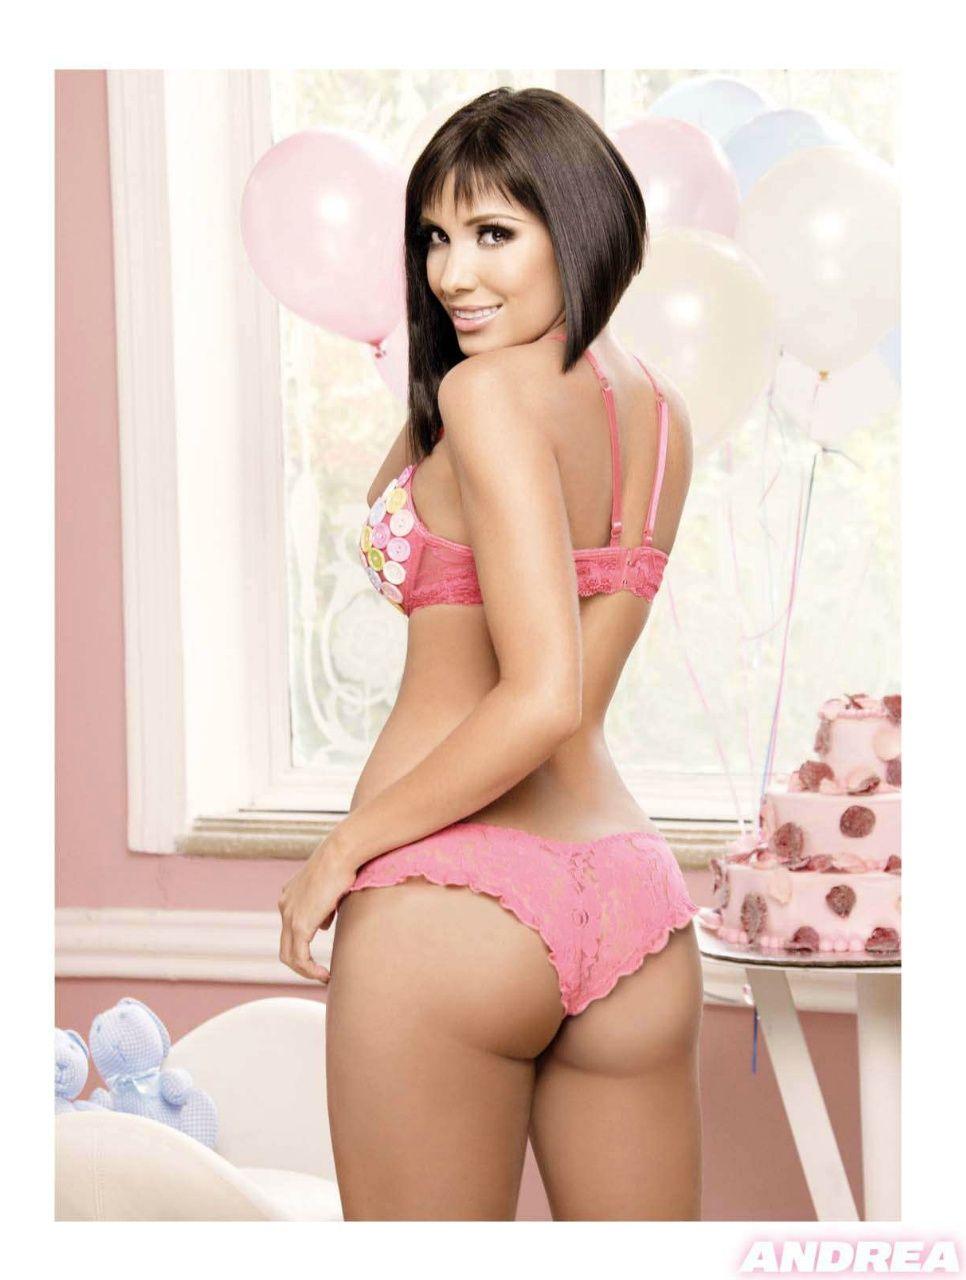 Andrea Escalona Desnuda playboy latin girls